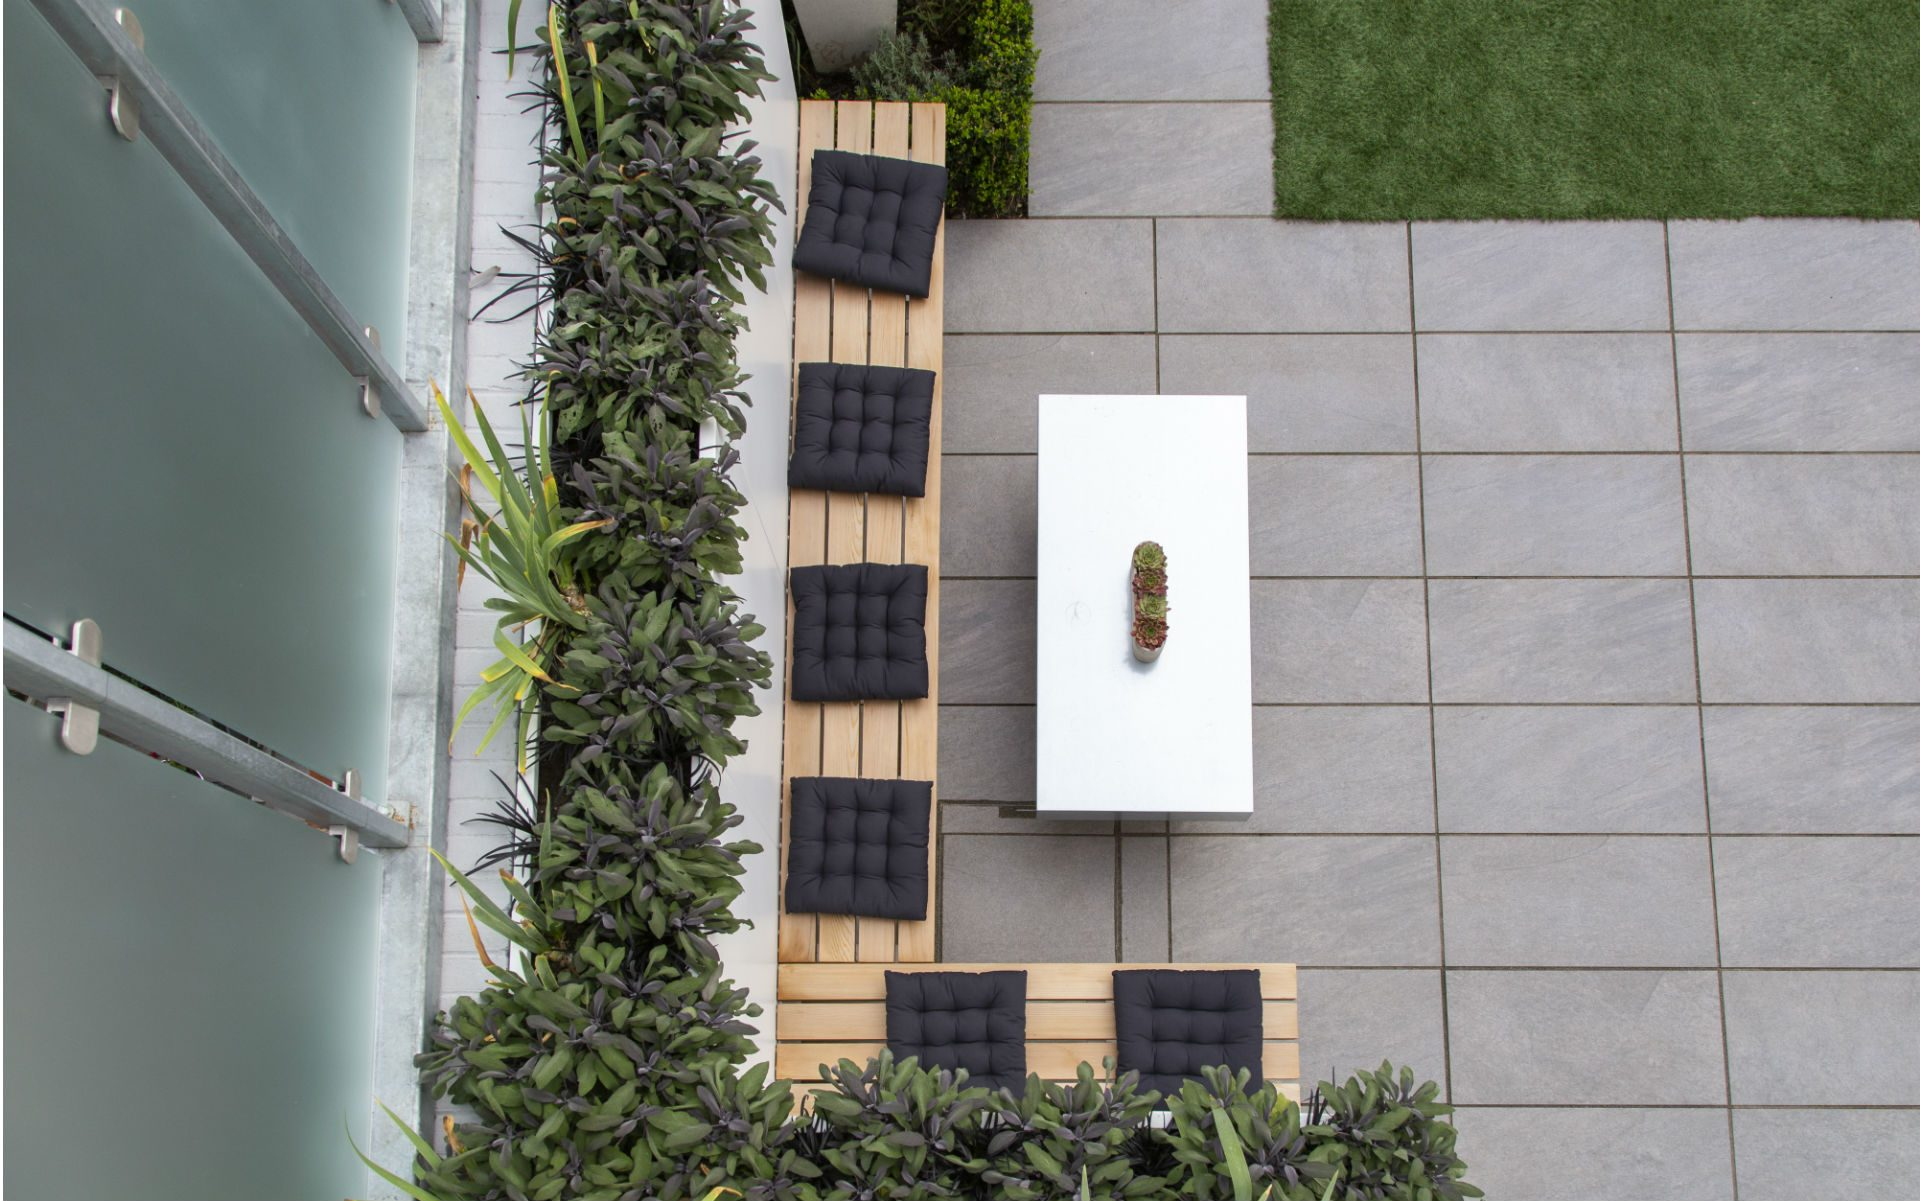 Contemporary Garden Furnishings Bespoke Cedar Bench Casual Outdoor Seating